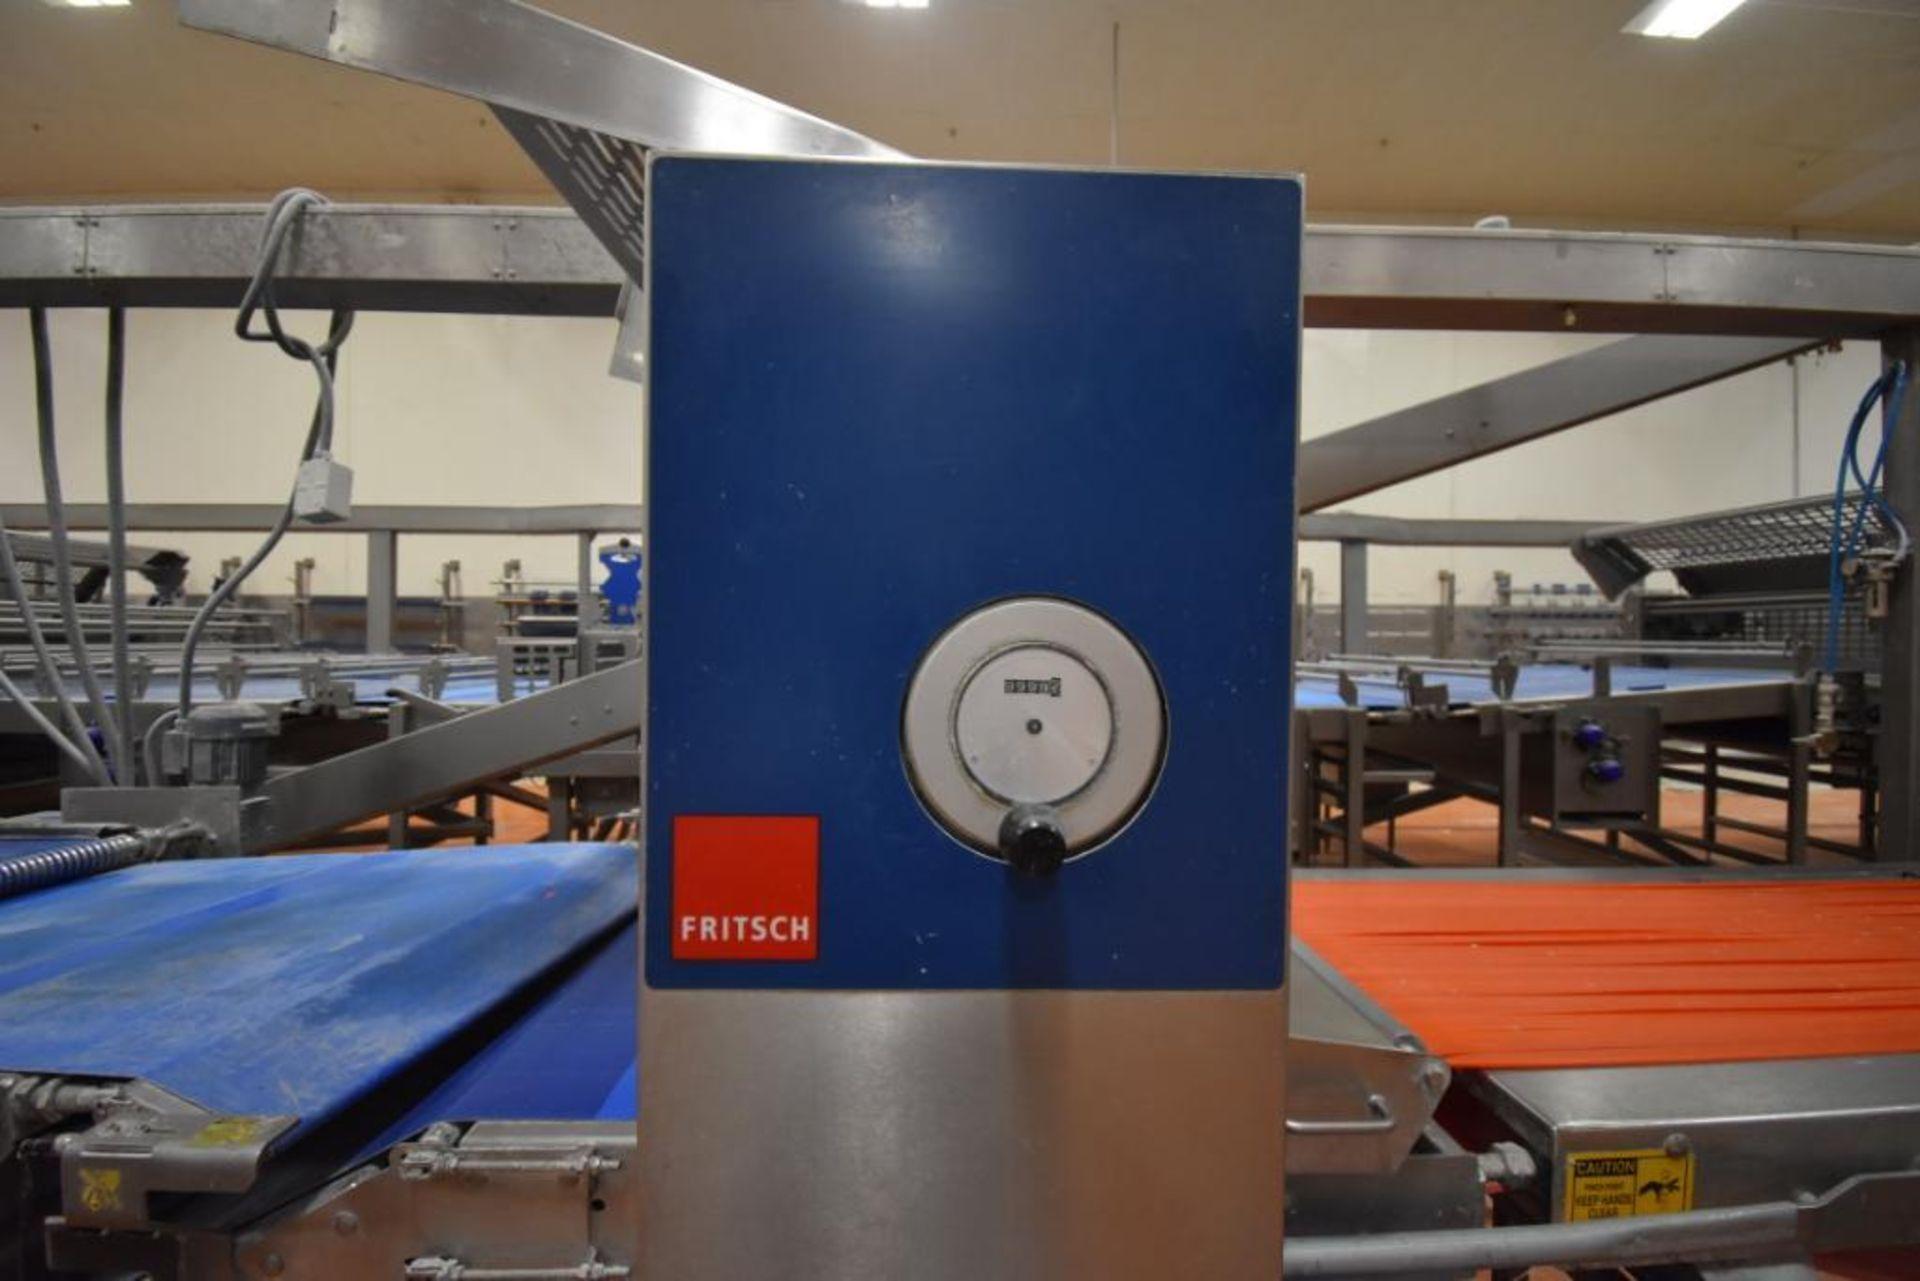 2007 Fritsch Laminator 3000 dough line - Image 94 of 280